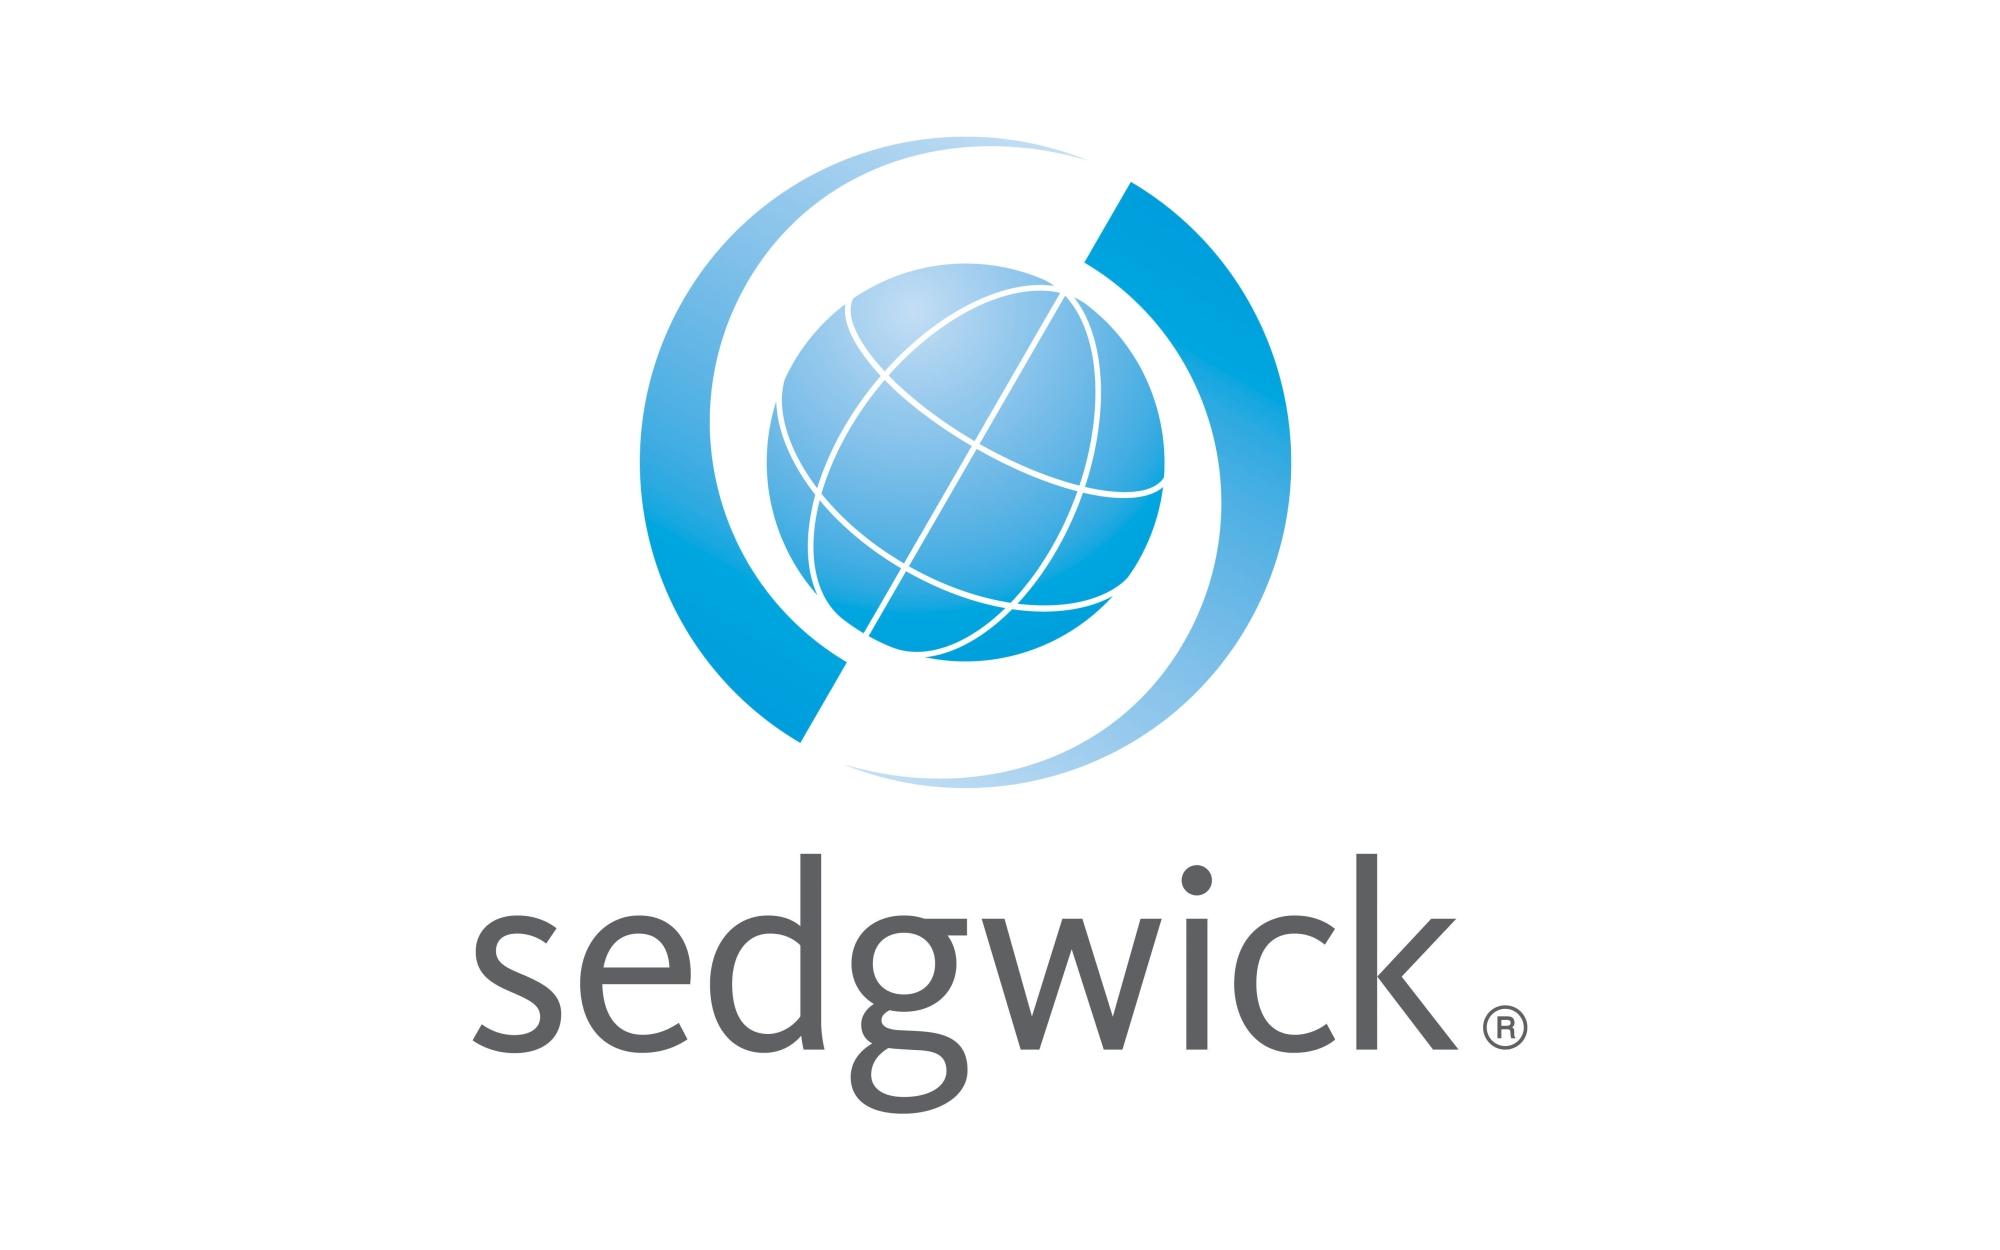 Sedgwick HiRes (PRNewsFoto/Sedgwick)